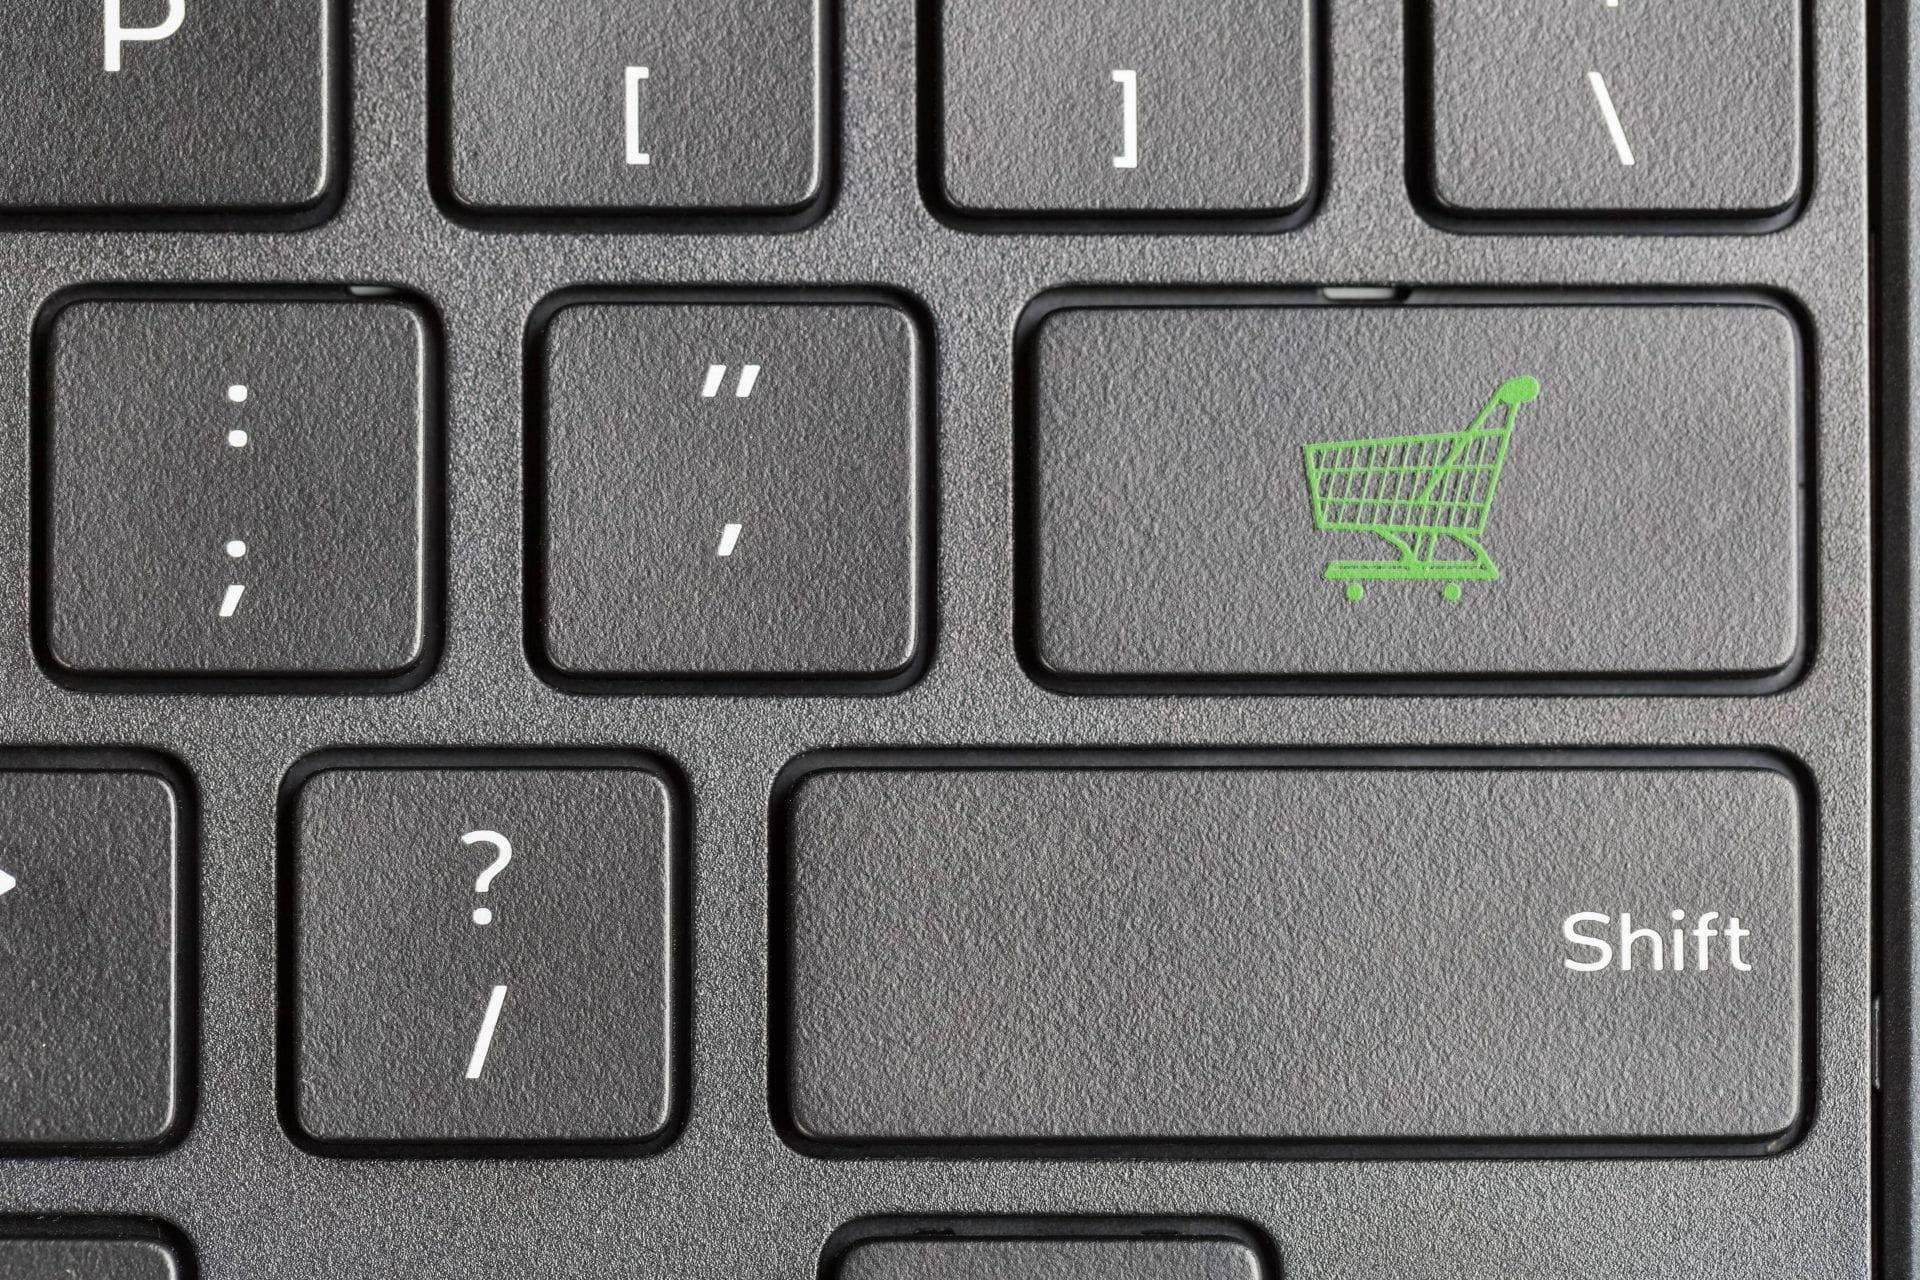 shopping-cart-icon-on-computer-keyboard-PKRKWB6-min